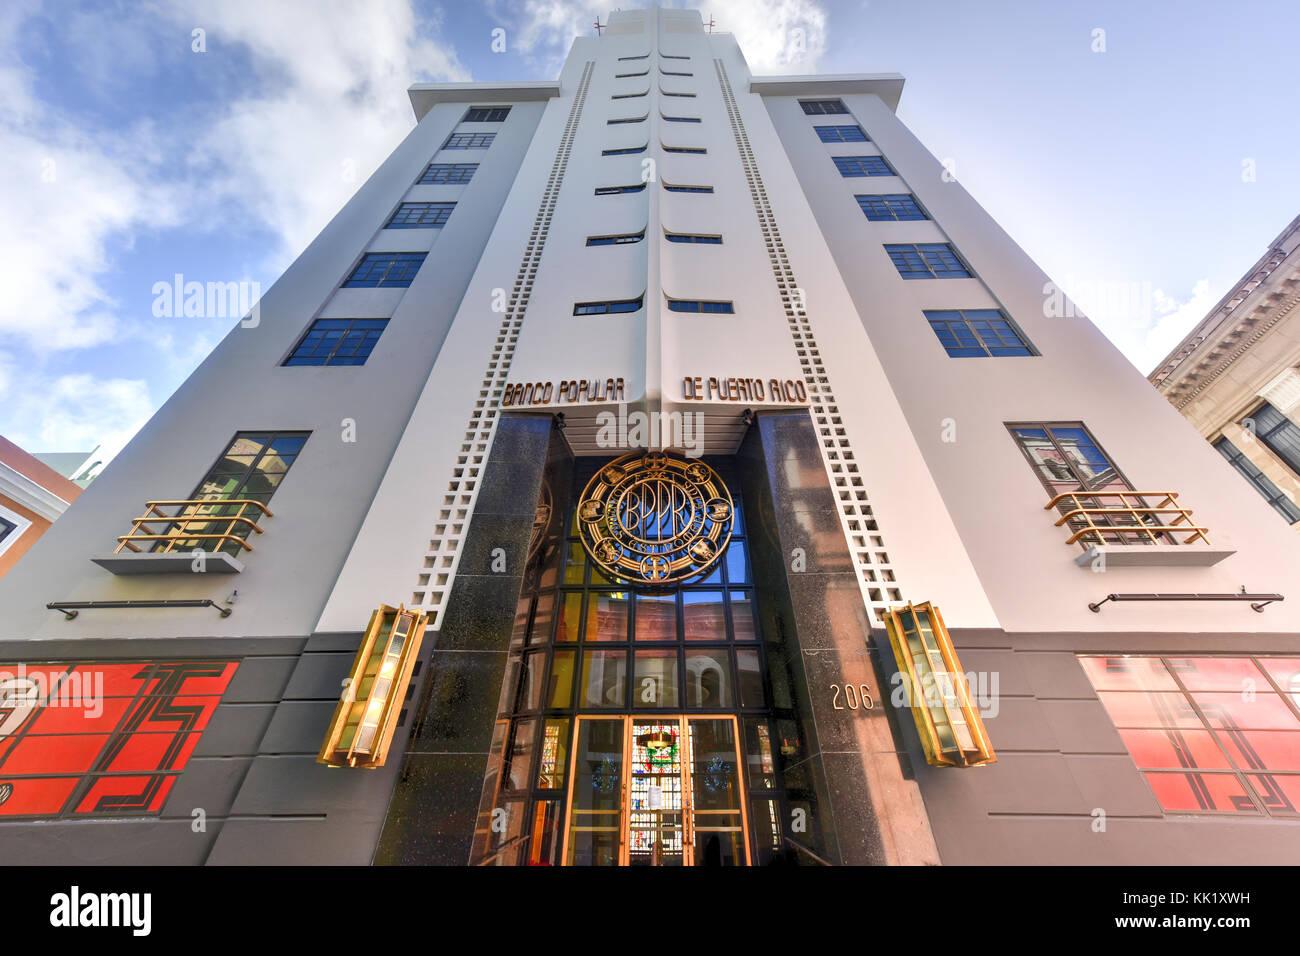 San Juan, Puerto Rico - December 25, 2015: Banco Popular in San Juan, Puerto Rico. The bank in the art deco style - Stock Image